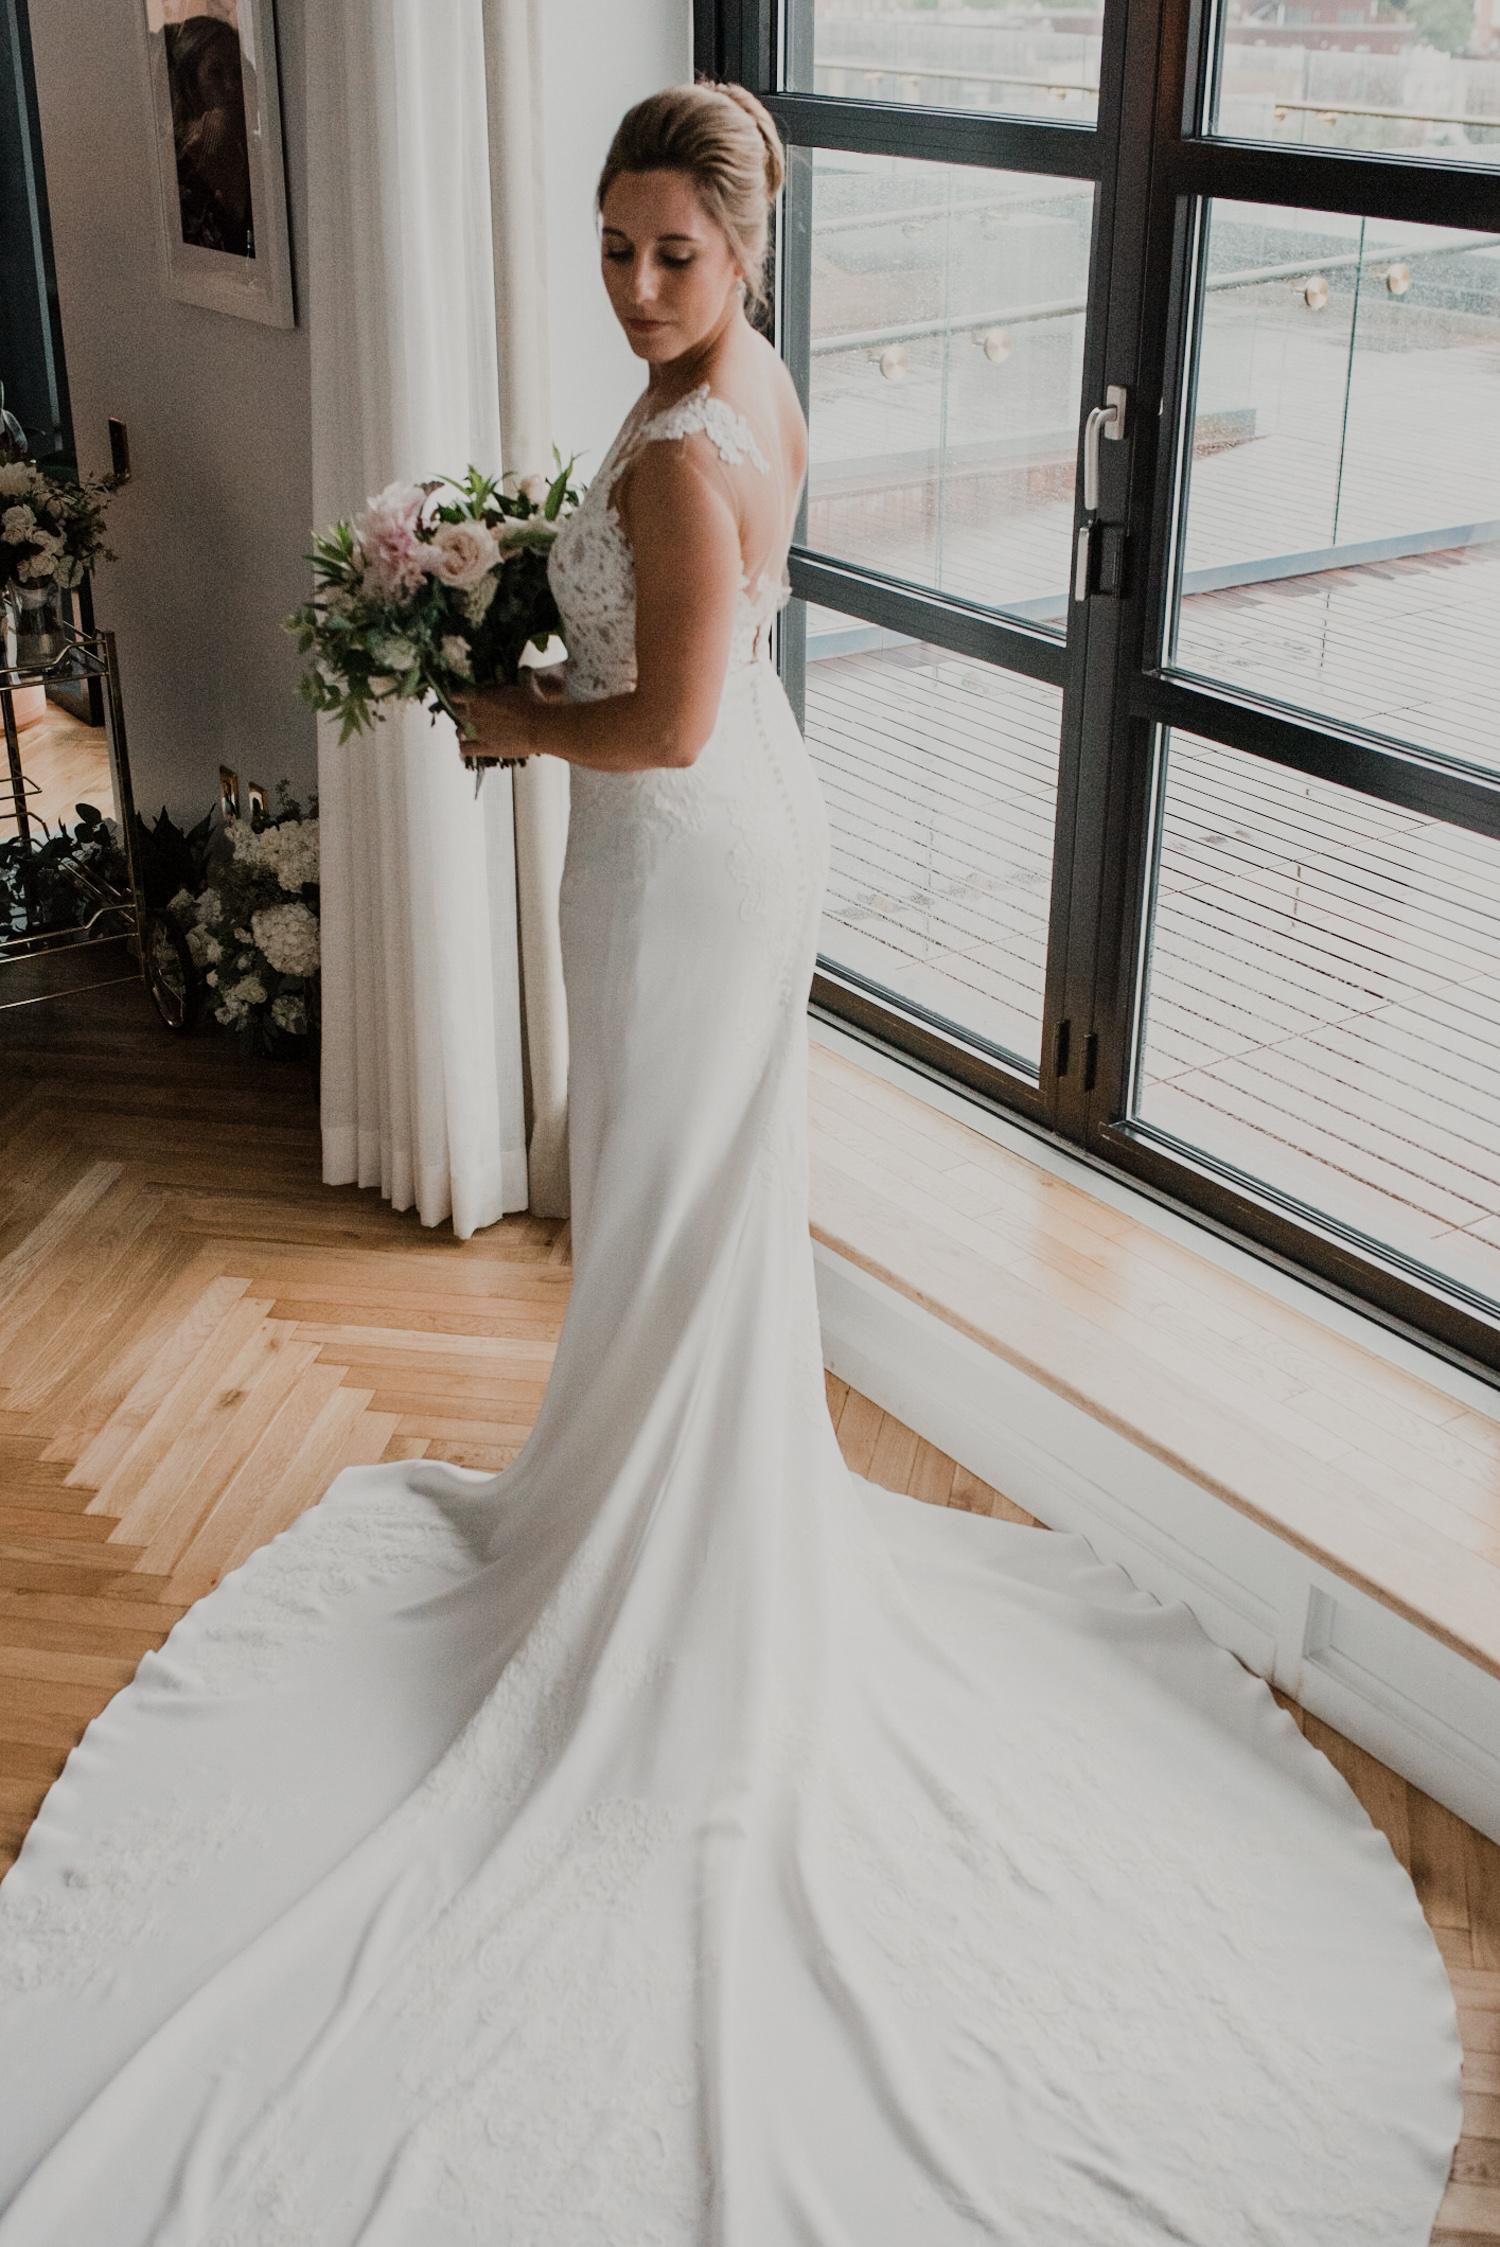 dc line hotel wedding-29.jpg